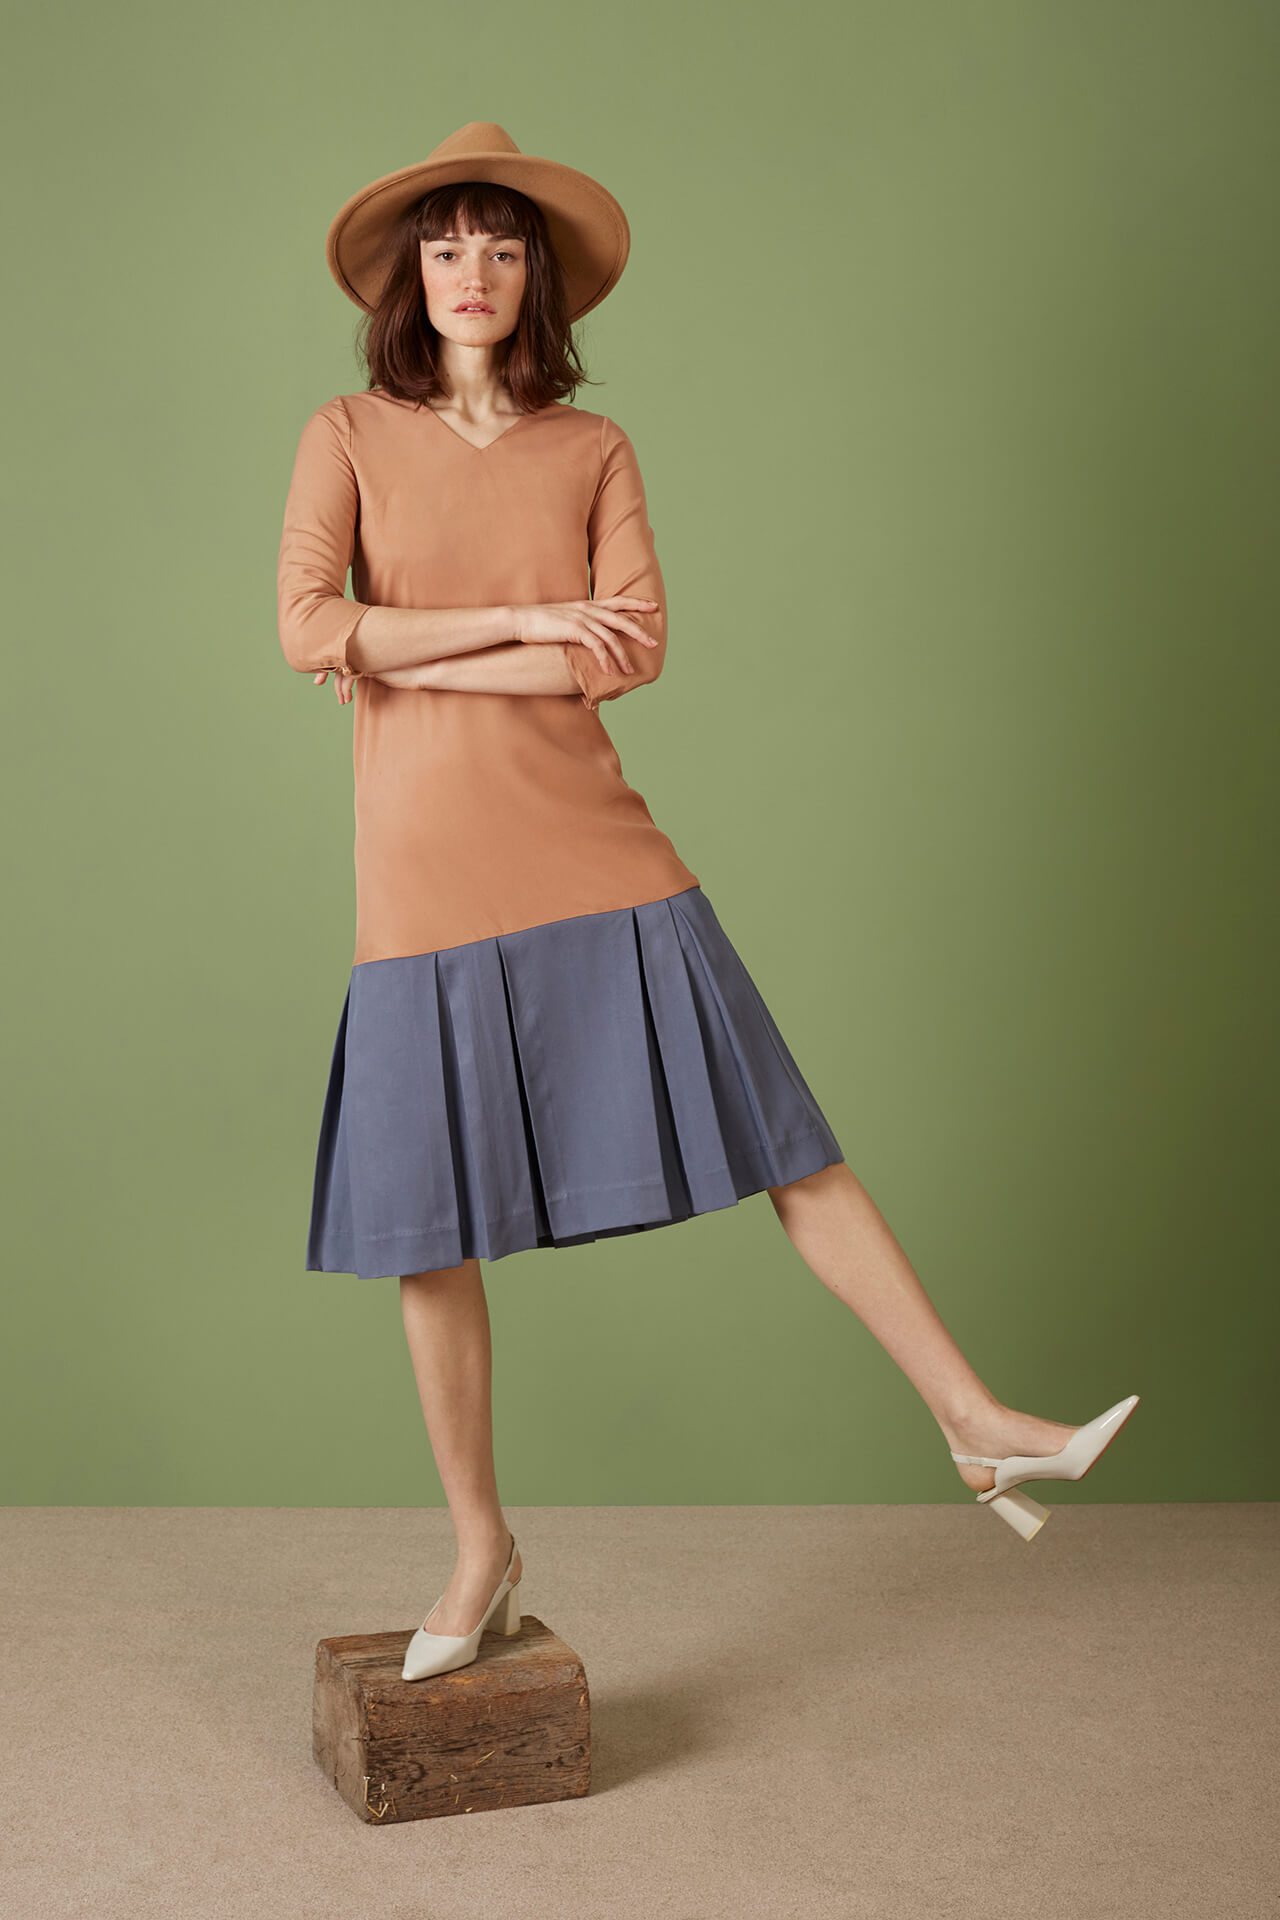 maria dress pigeon blue and copper tan